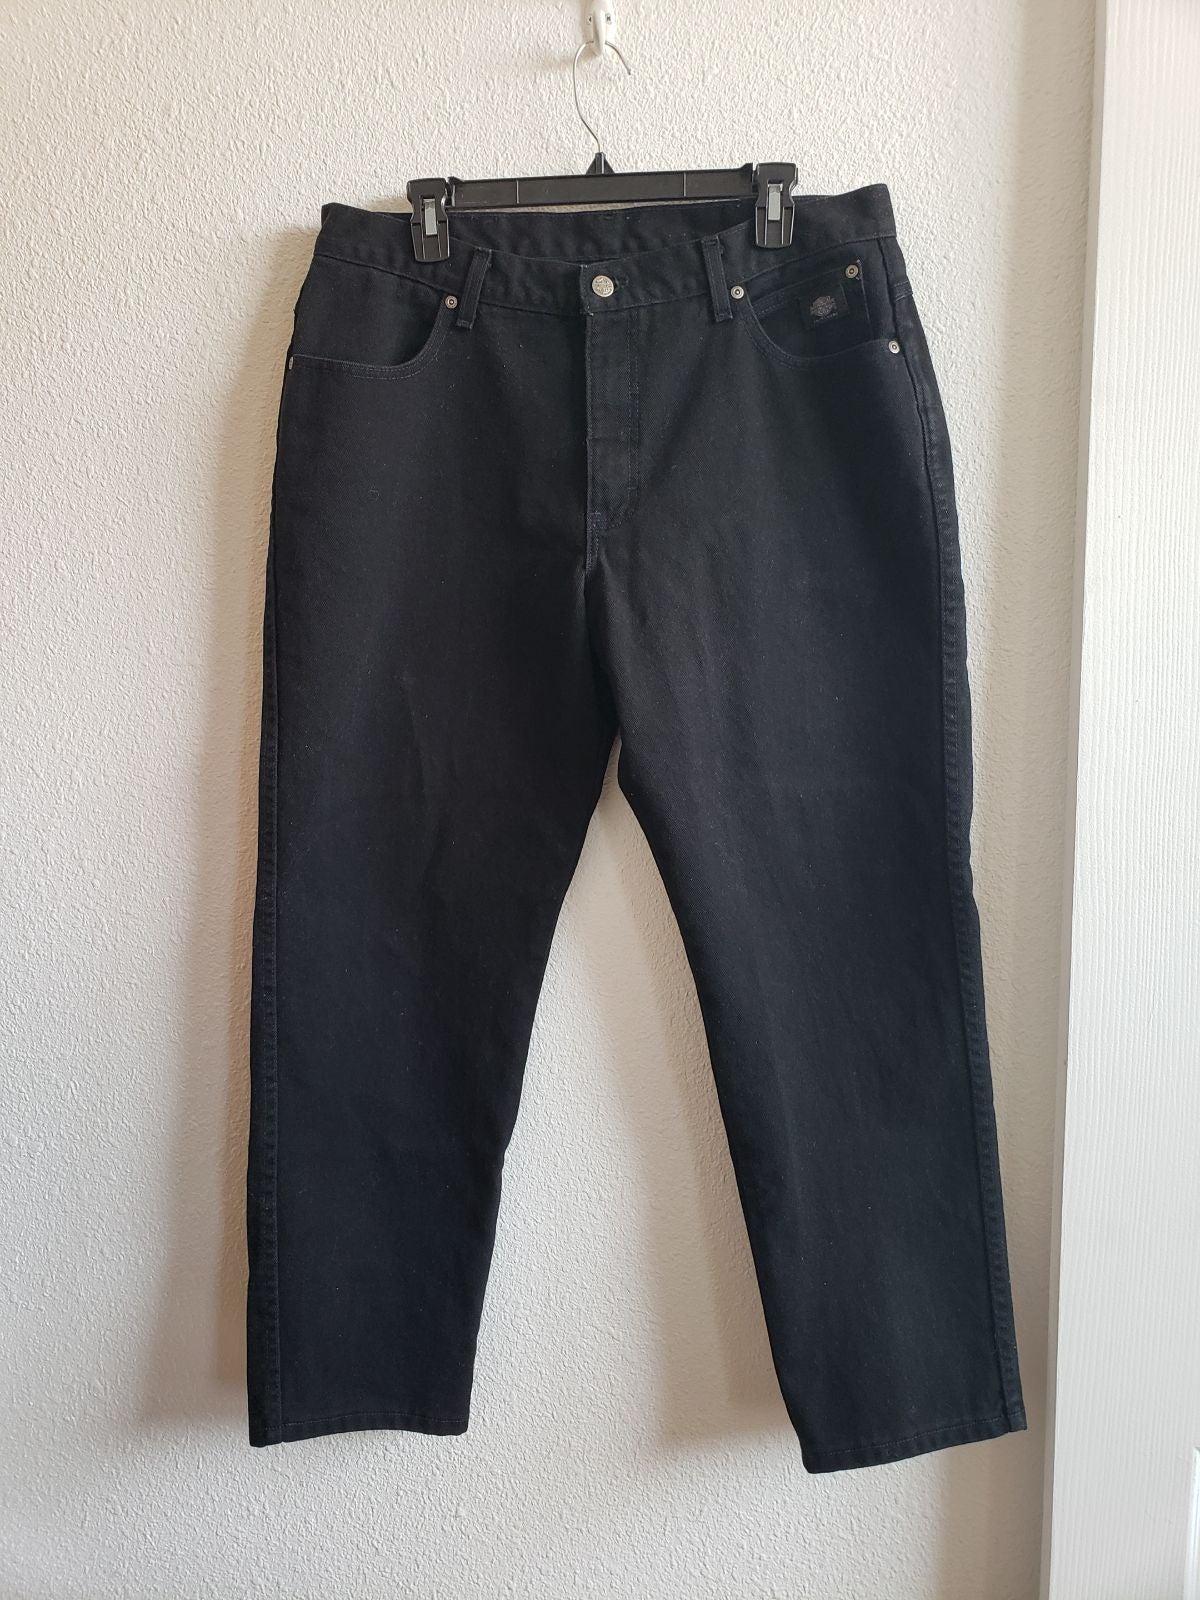 Harley Davidson  Cotton black  jeans